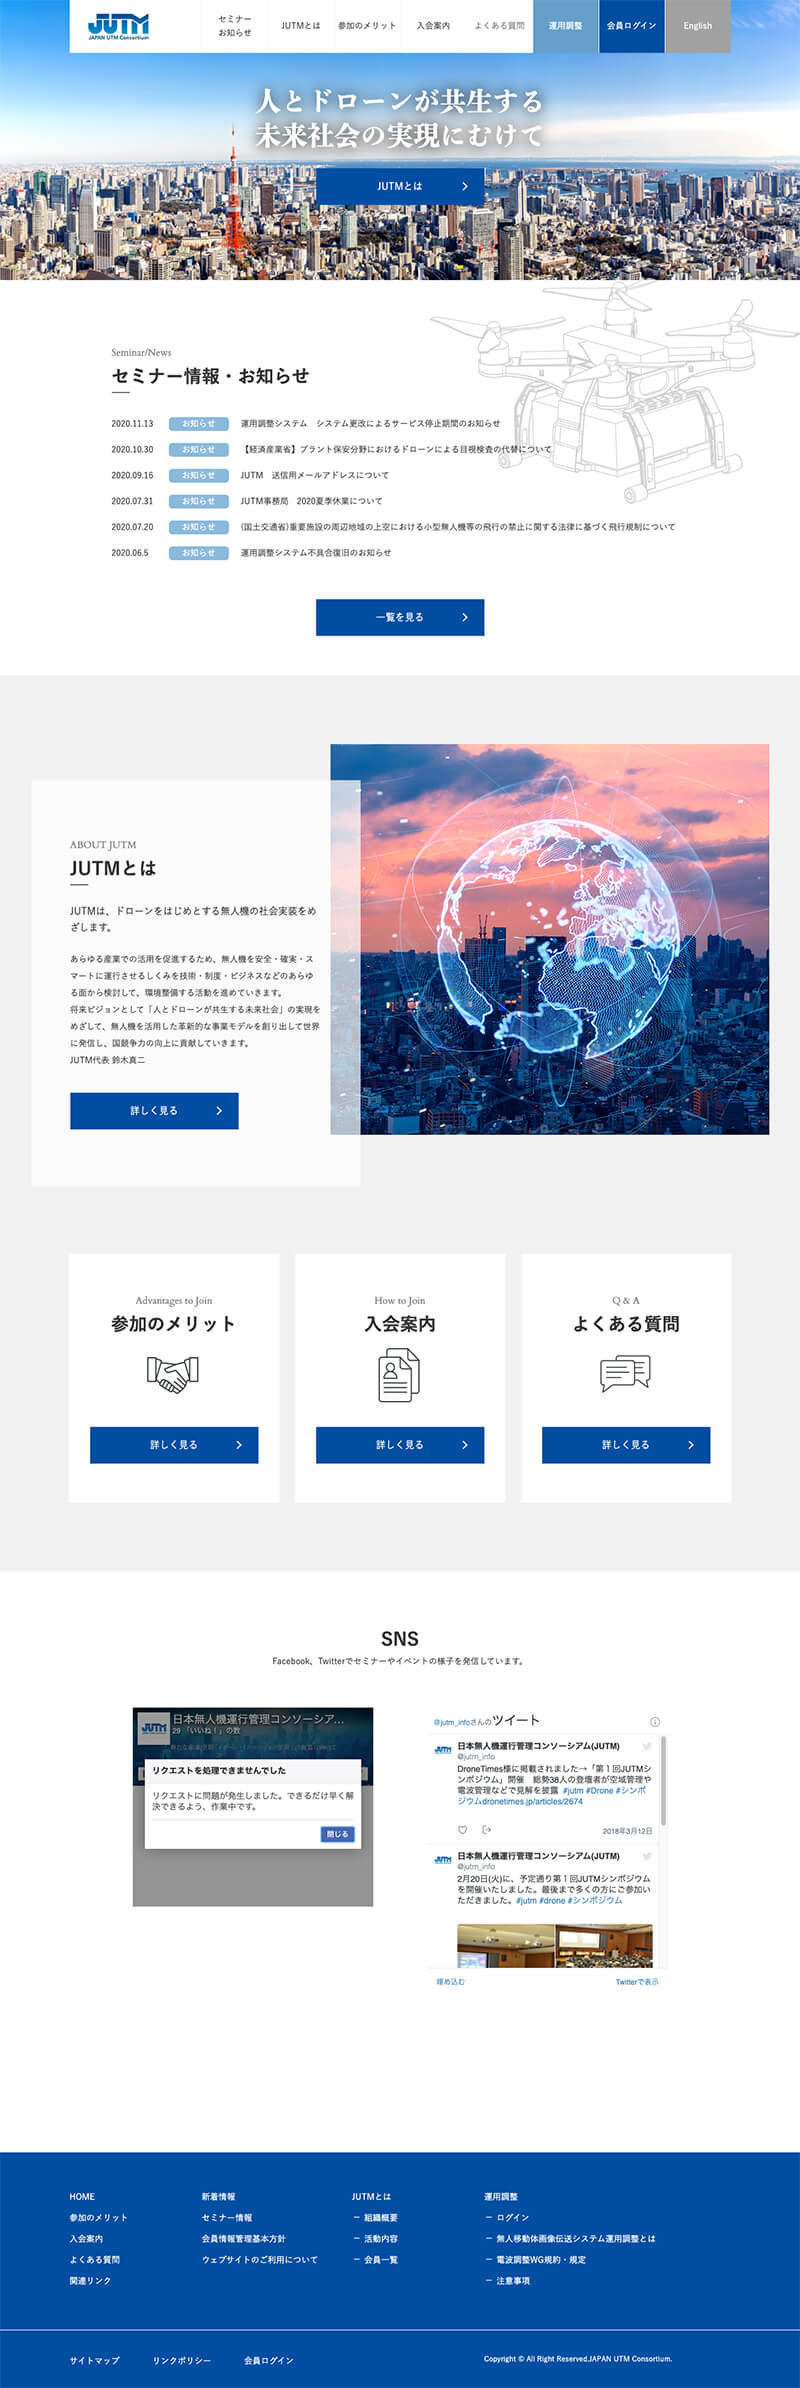 JUTM 日本無人機運行管理コンソーシアム